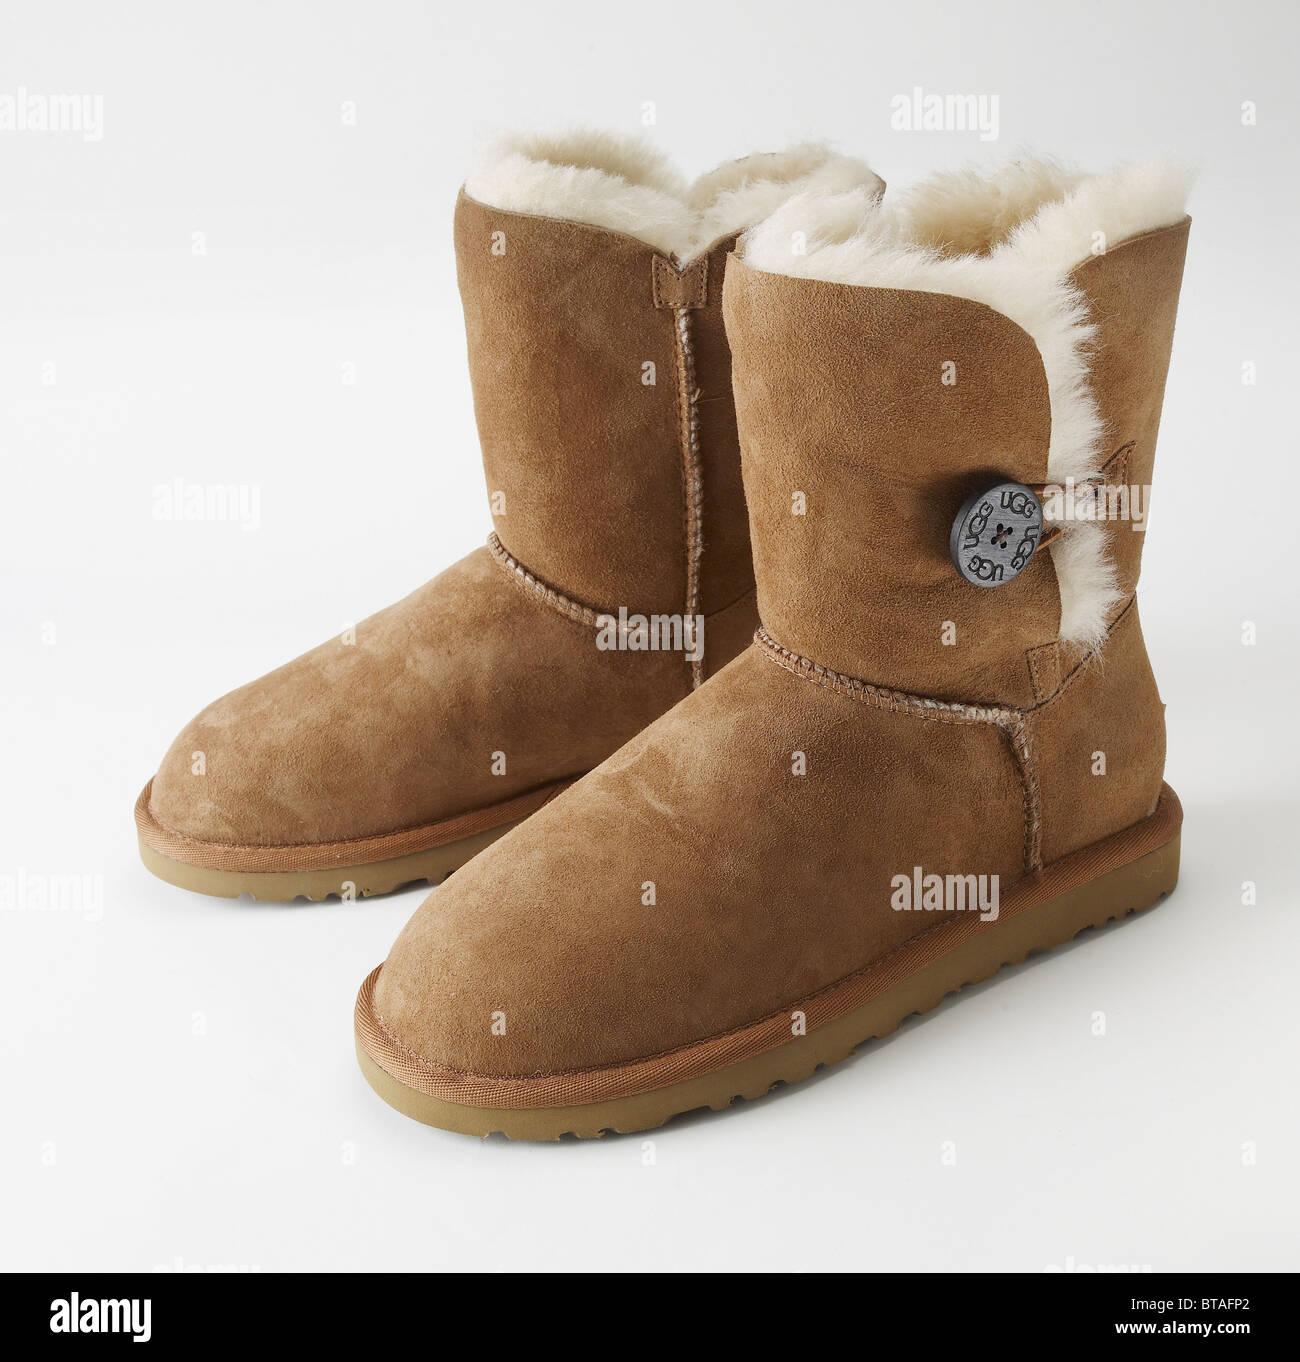 Ugg Schuhe Damen Günstig (OS24328) Grau Florence